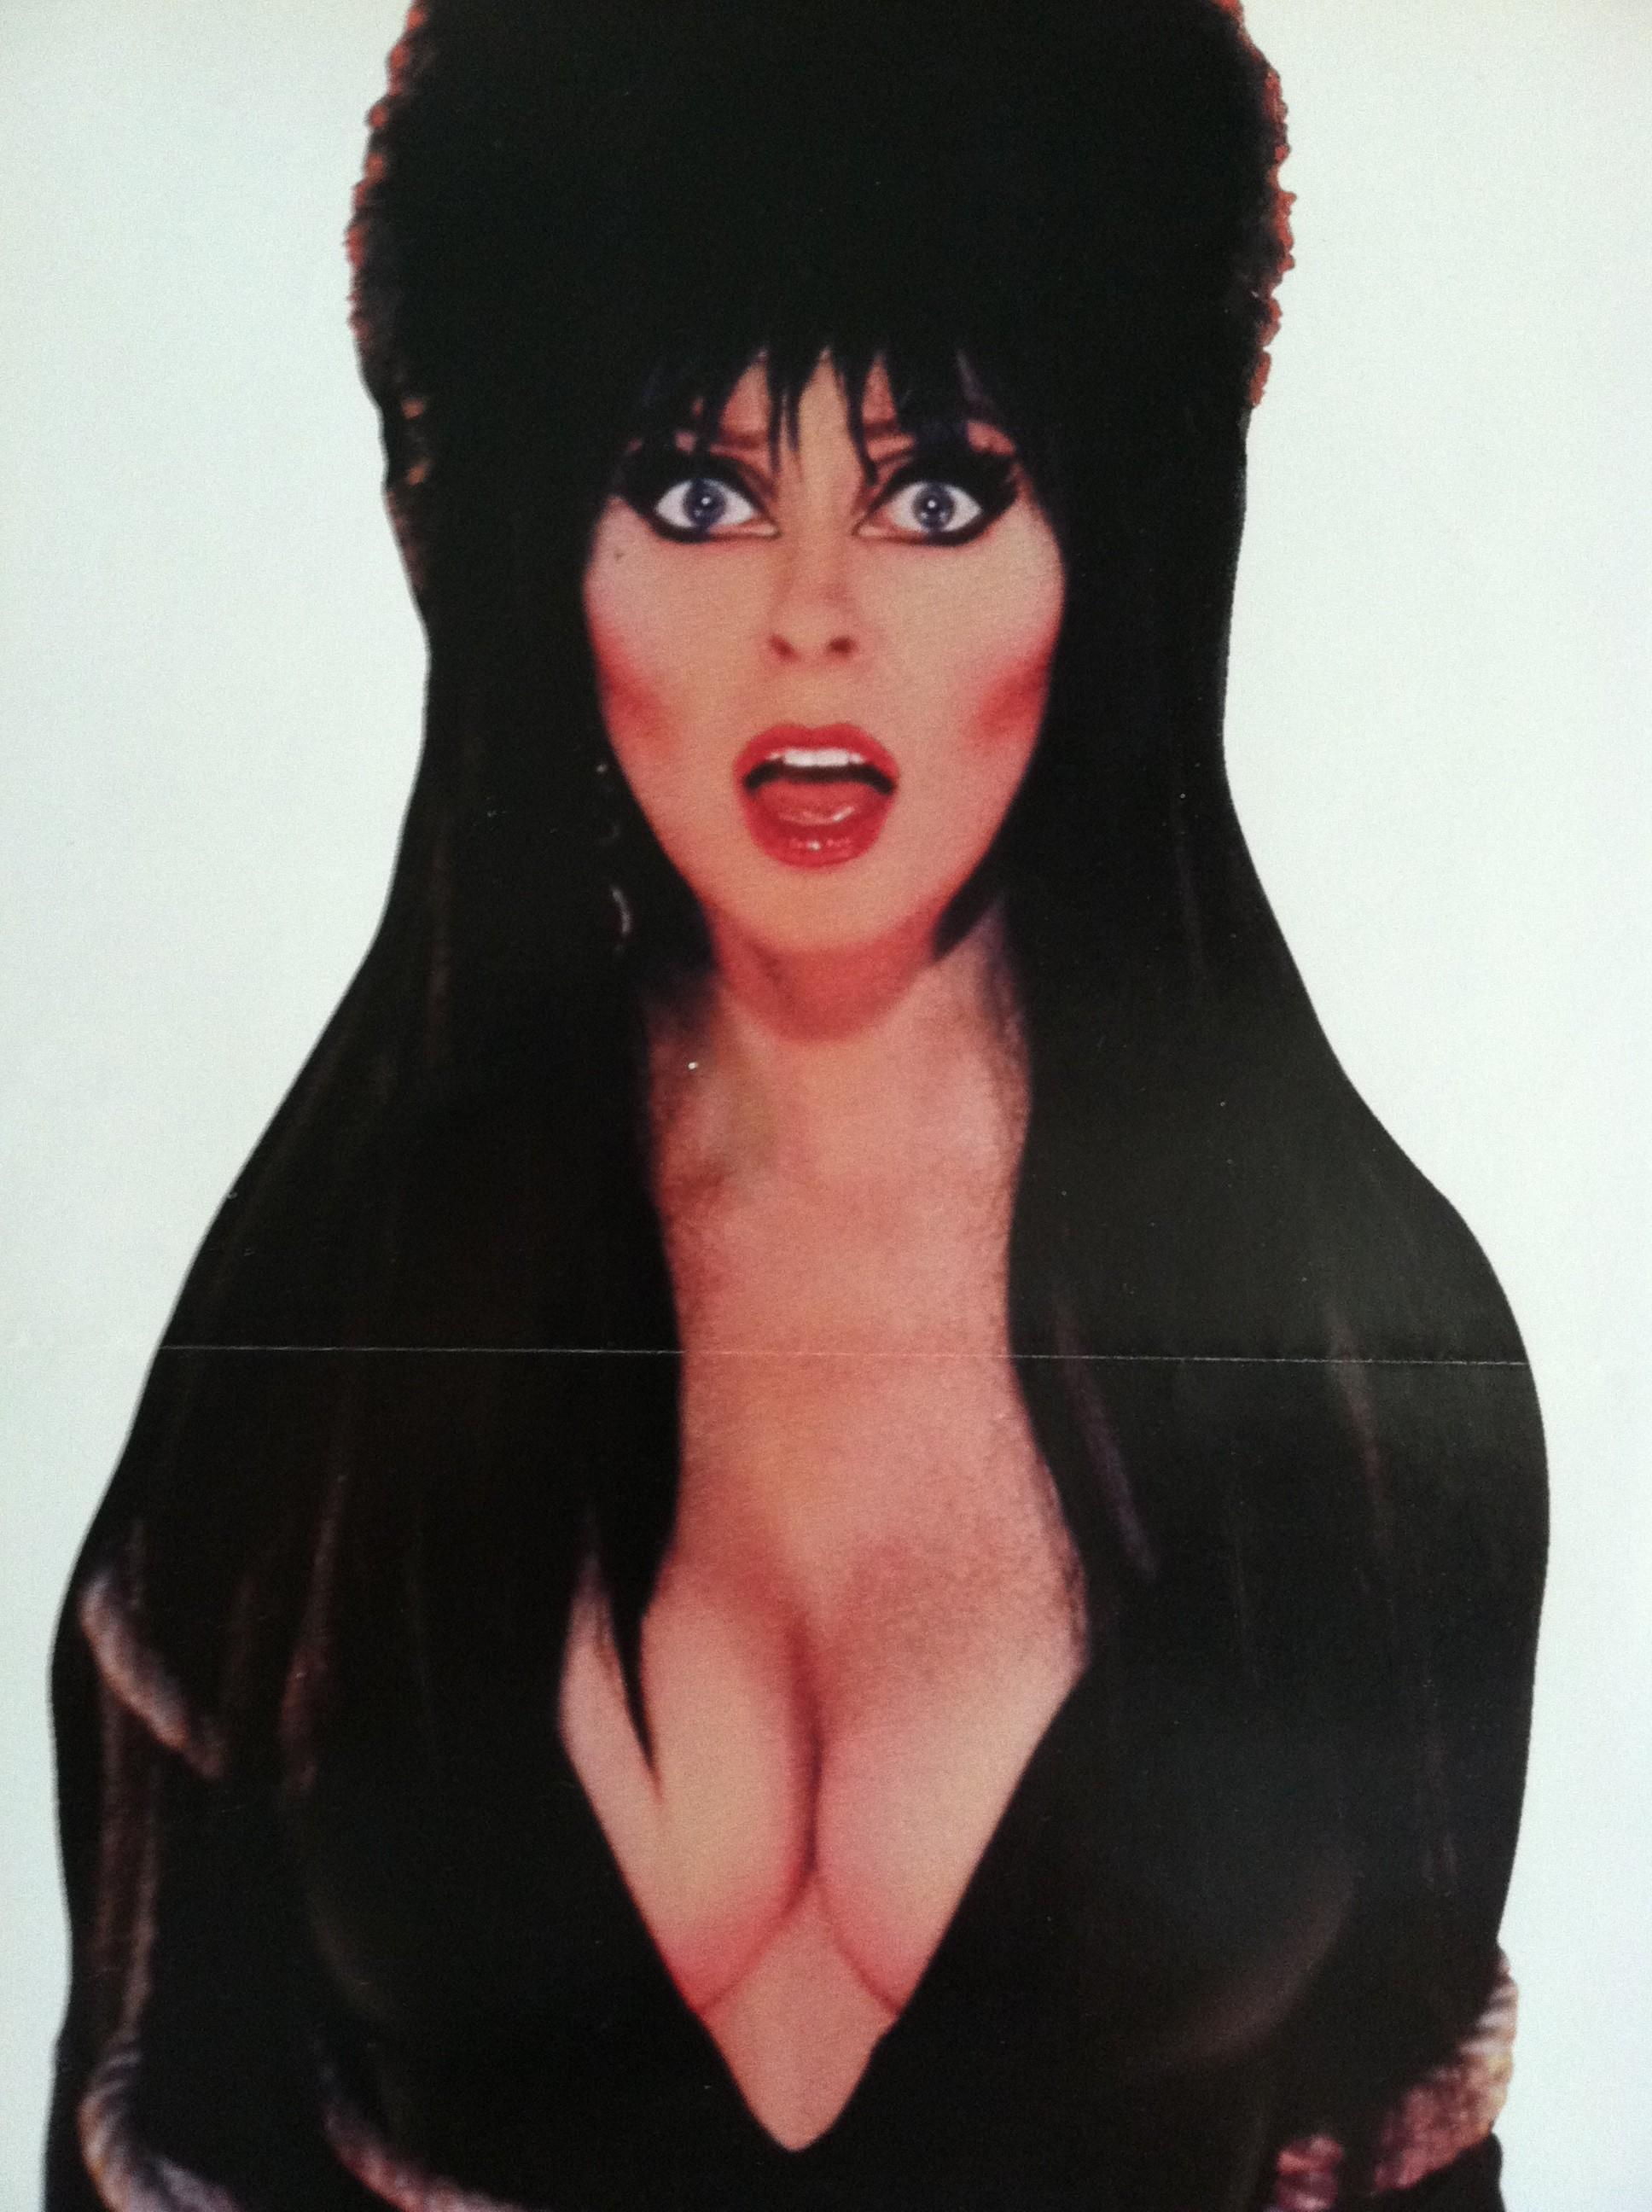 elvira   Home › Comedy › Elvira Mistress of the Dark